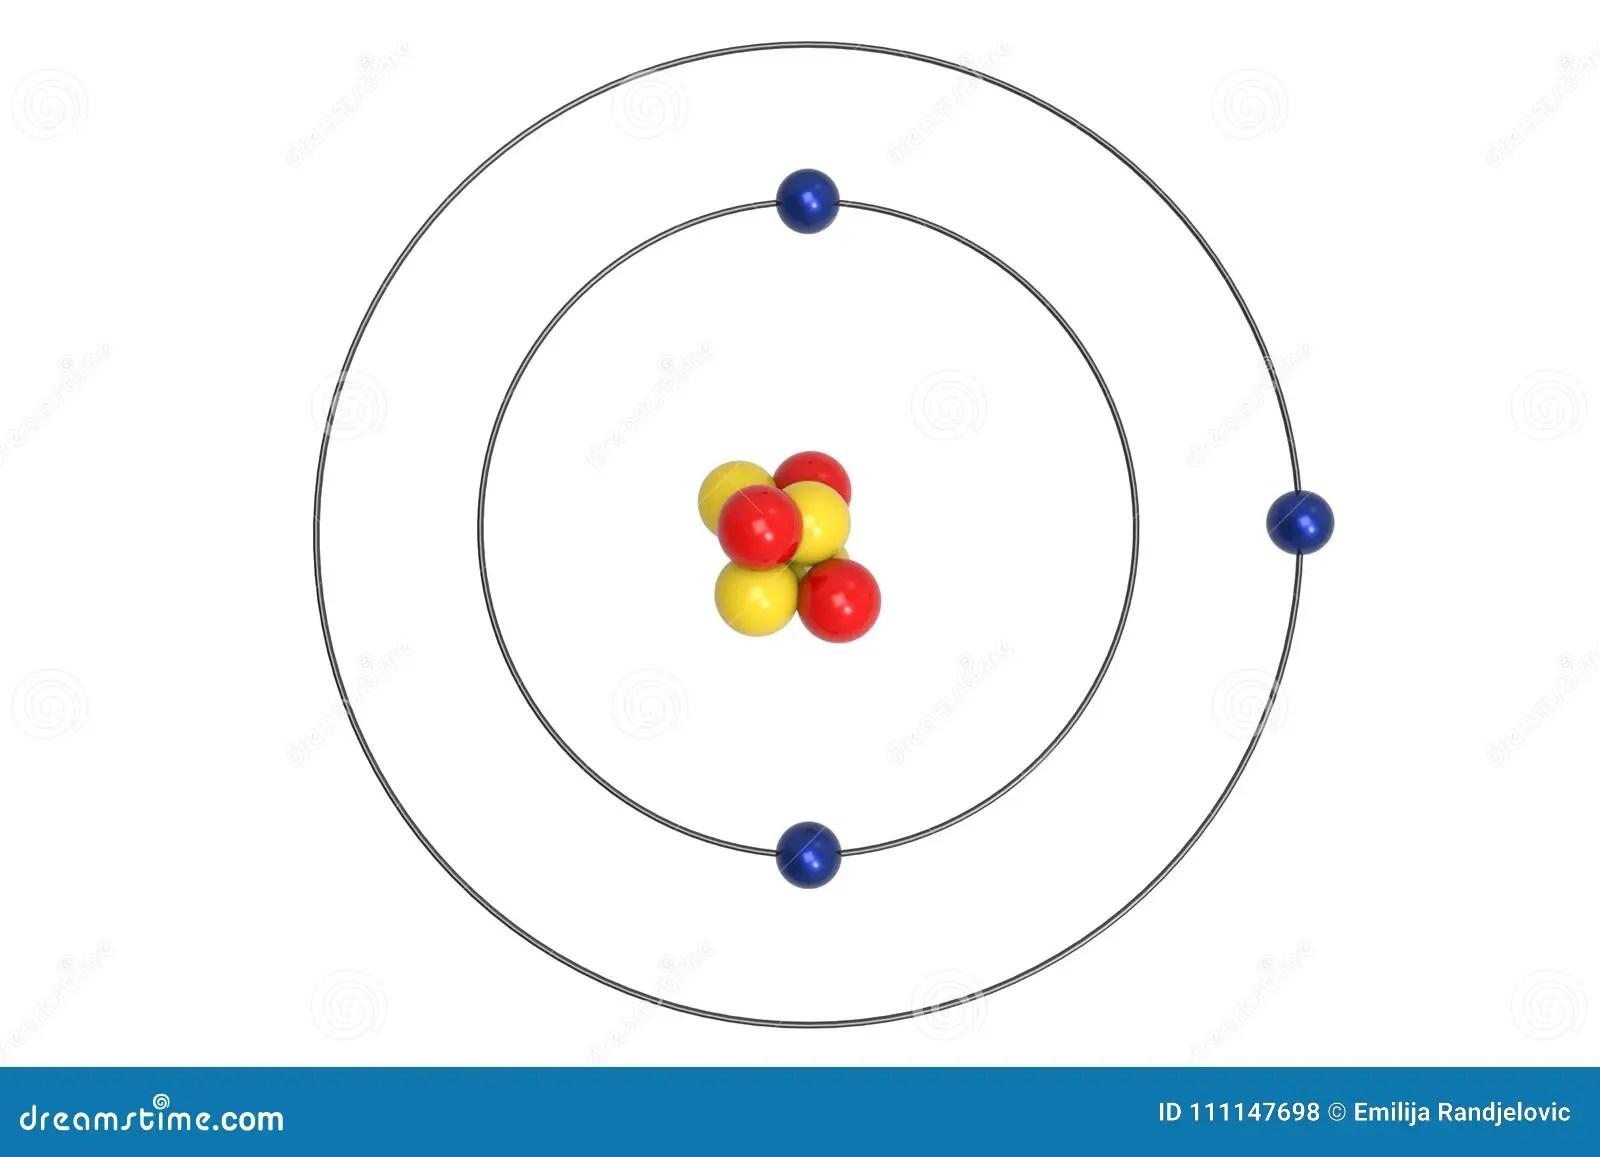 hight resolution of lithium atom bohr model with proton neutron and electron